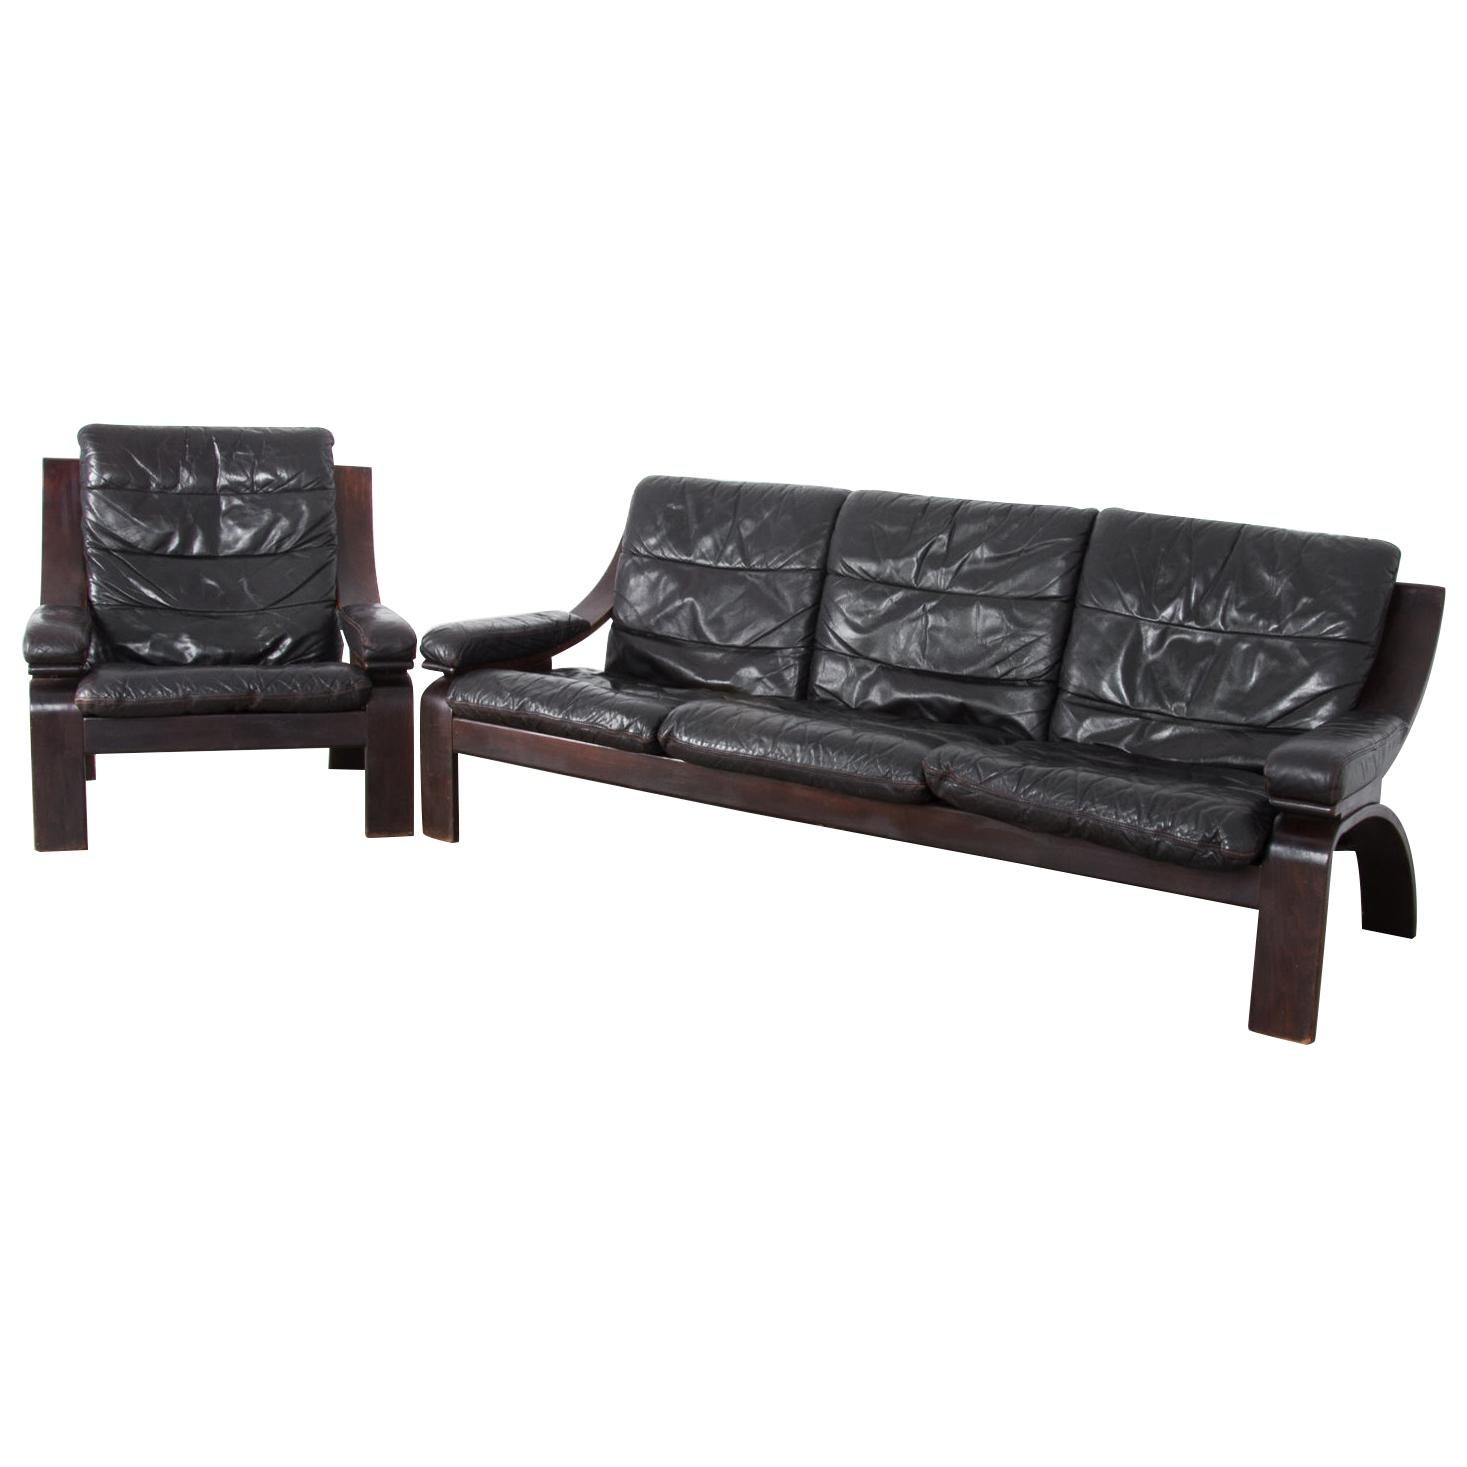 Midcentury Norwegian Leather Sofa and Armchair Set